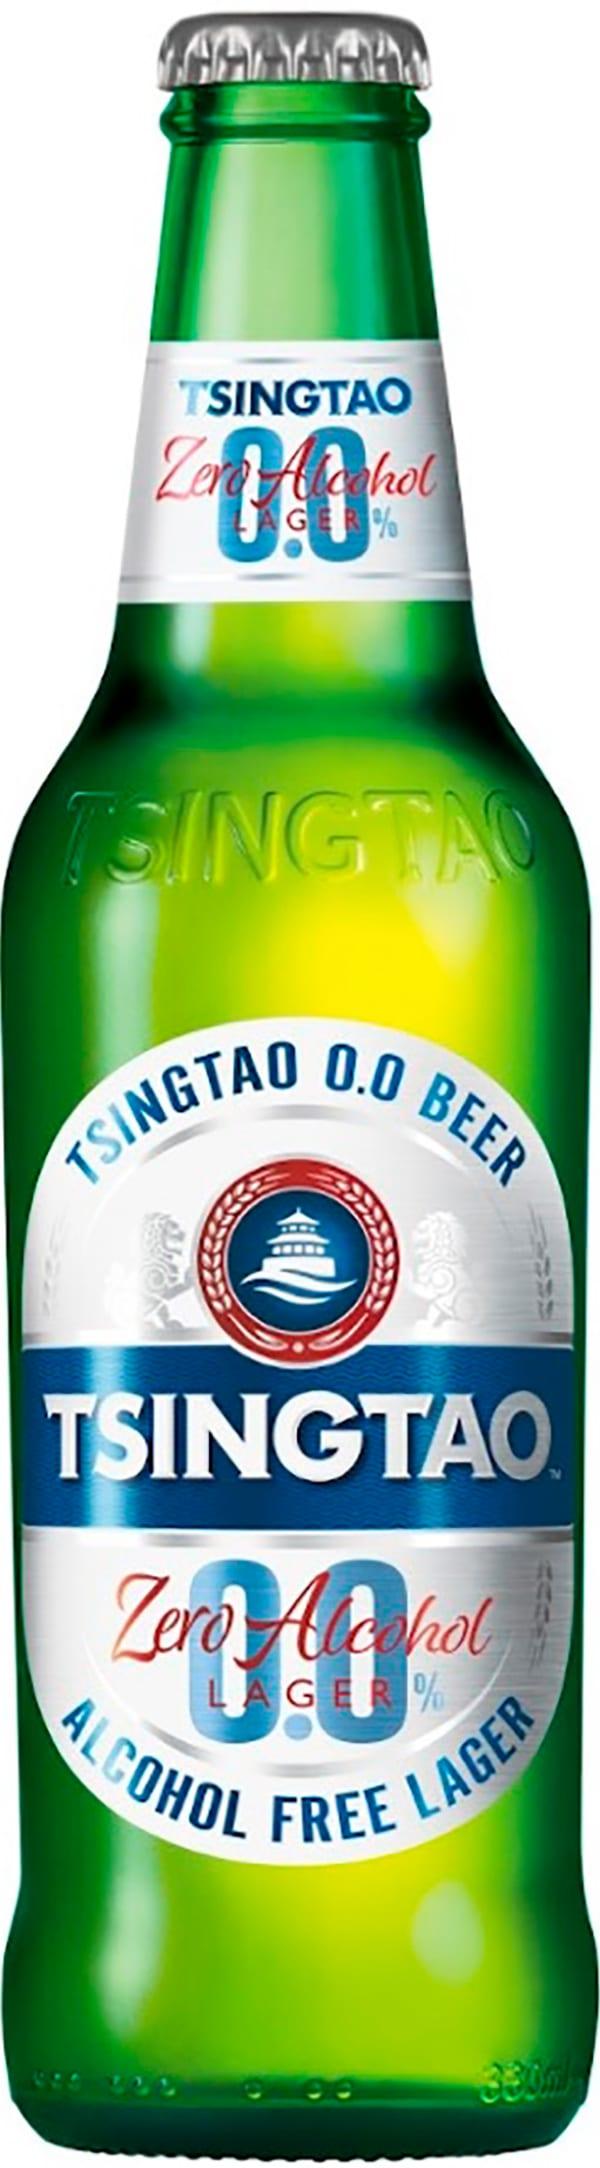 Tsingtao Alcohol Free Lager